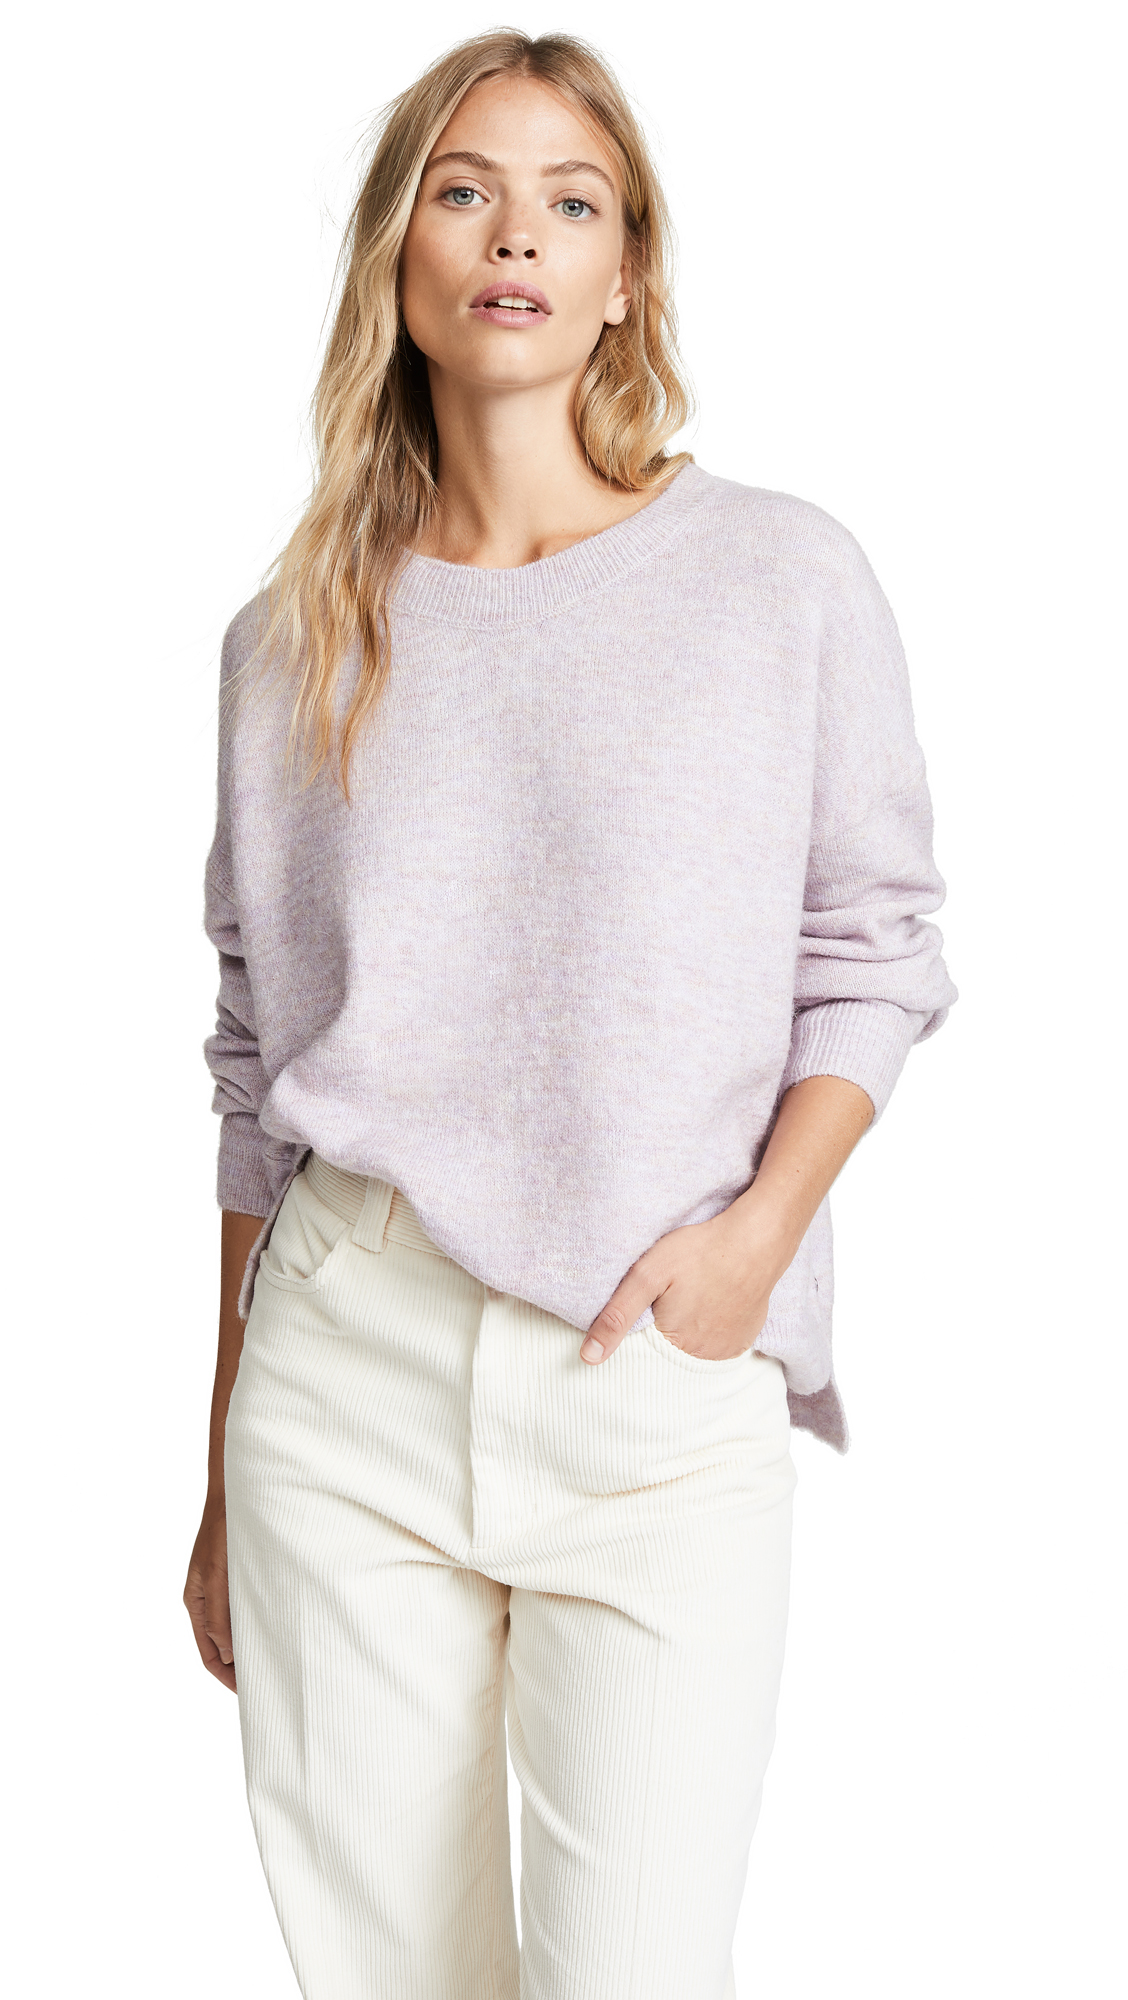 SCOTCH & SODA/MAISON SCOTCH Basic Crew Sweater in Lilac Melenge